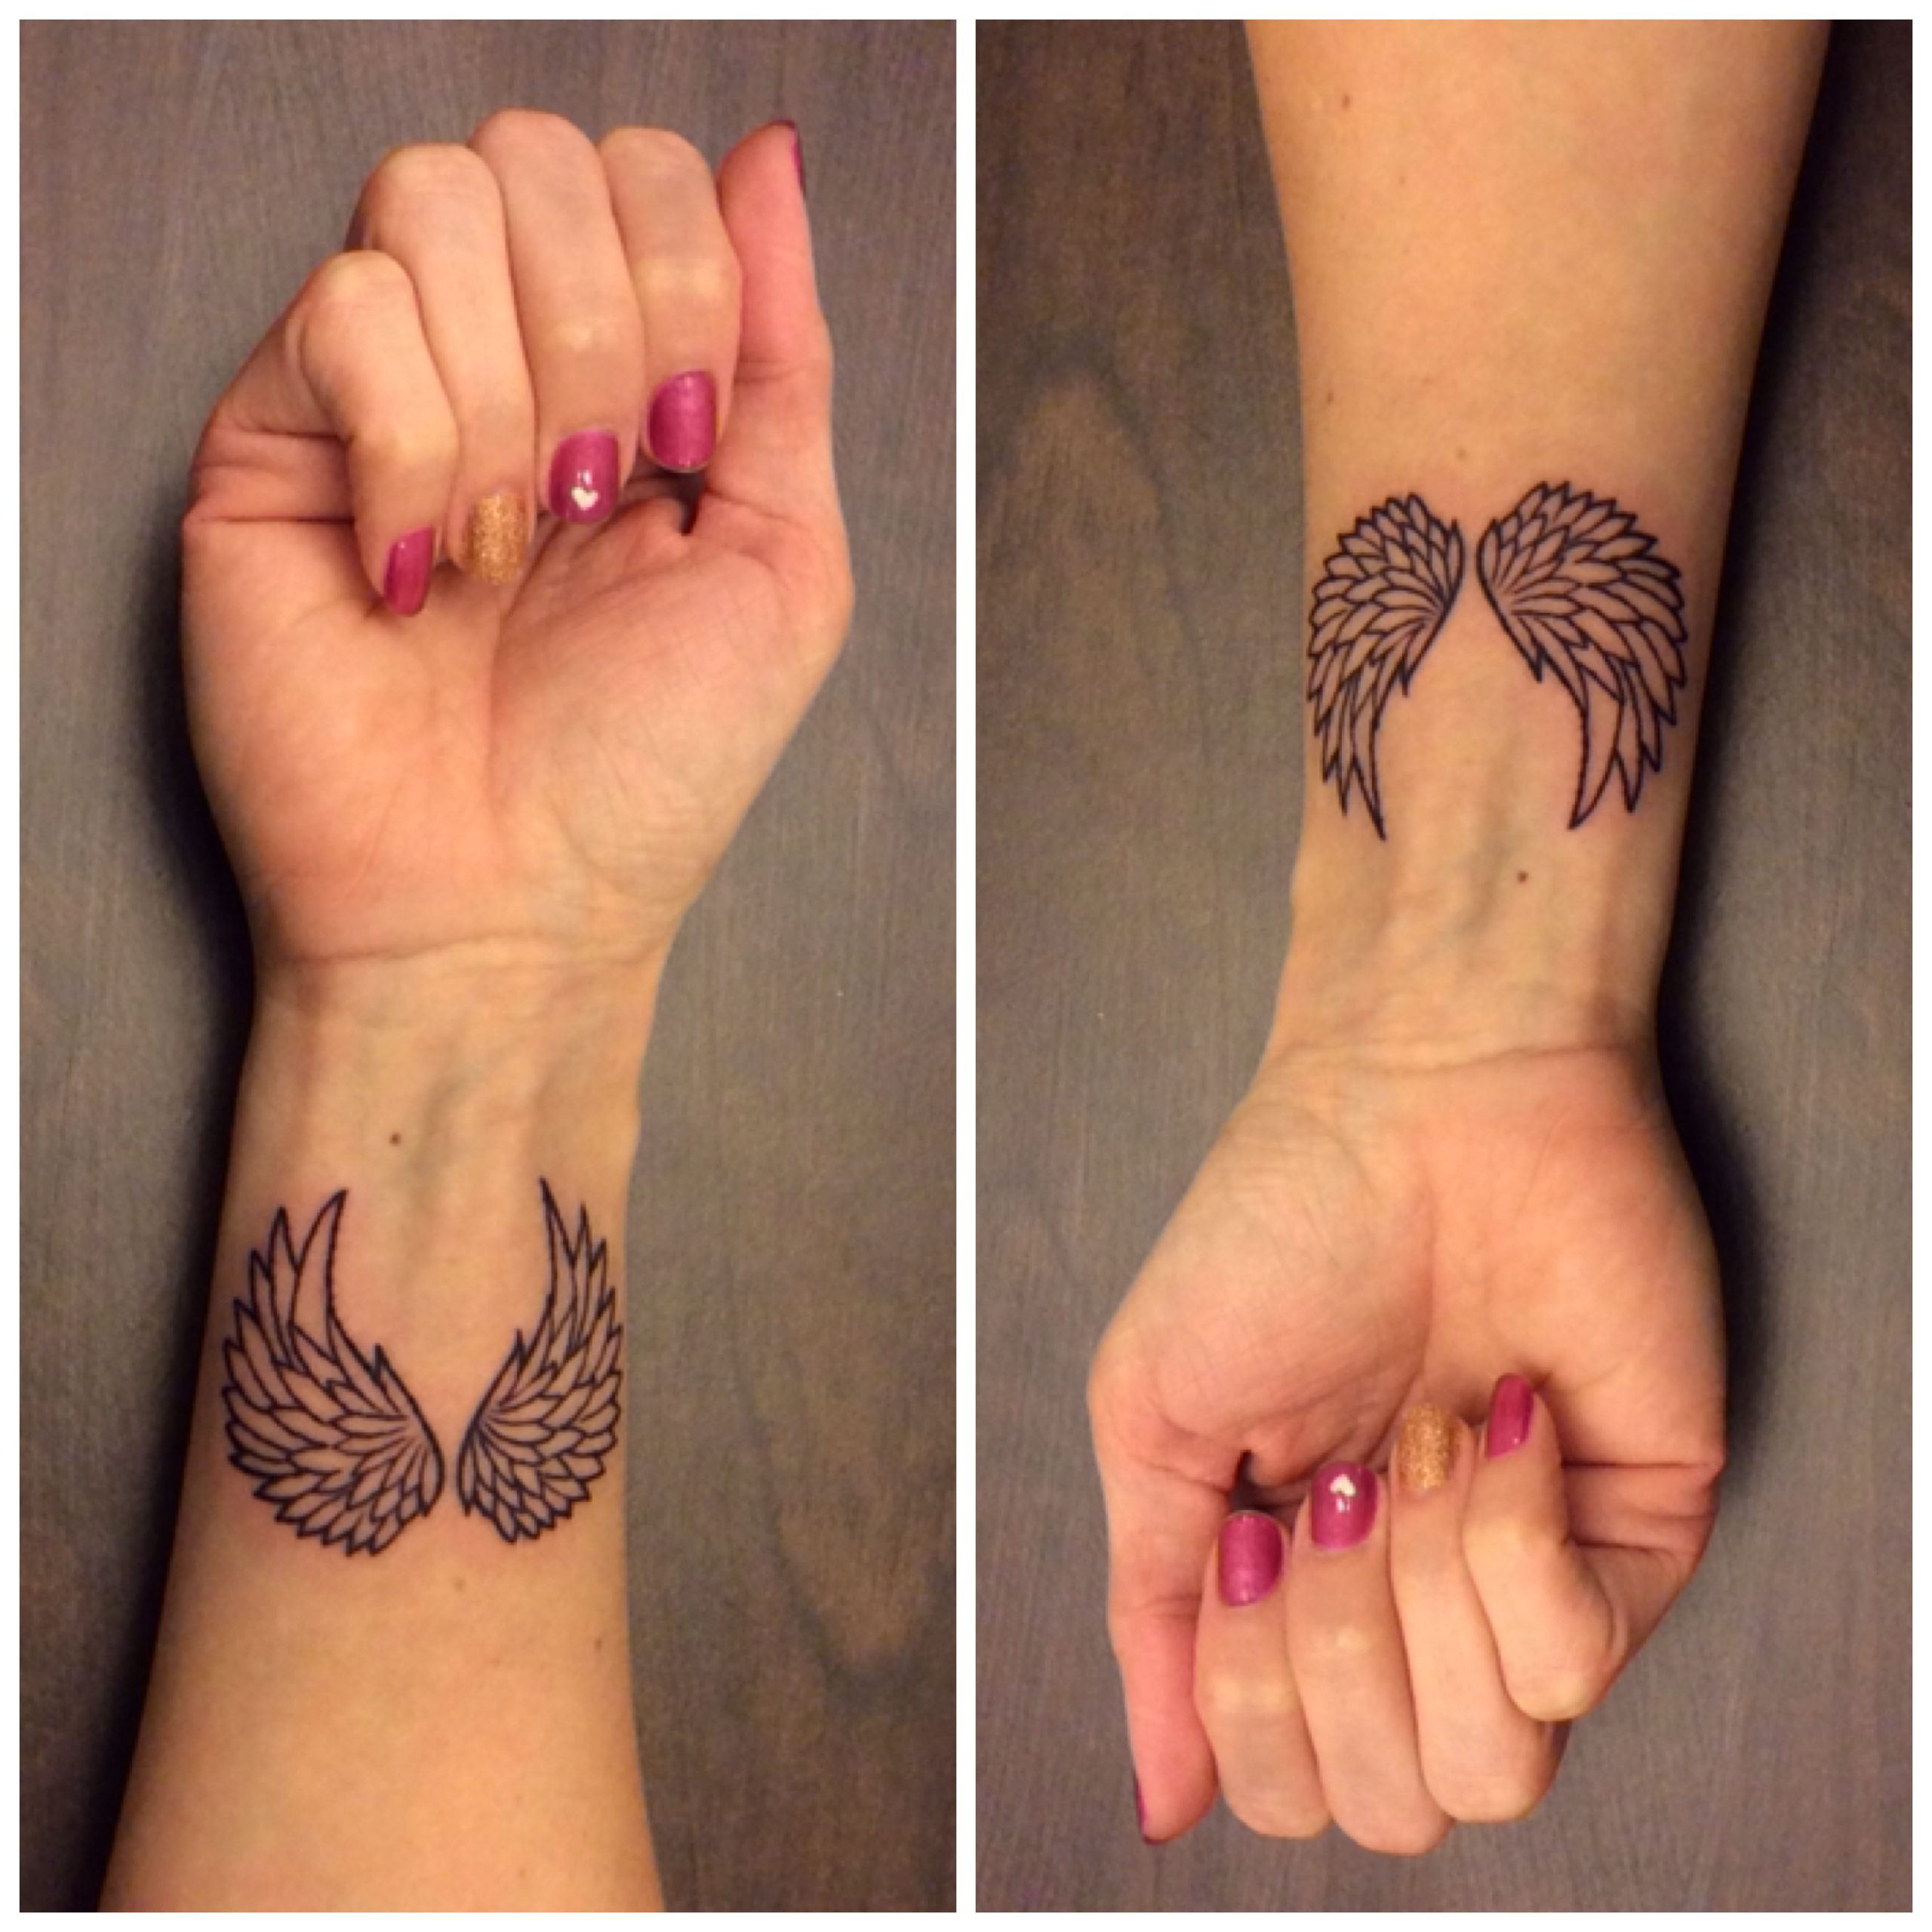 Tattoo Ideas Baby: Best 25+ Baby Memorial Tattoos Ideas On Pinterest